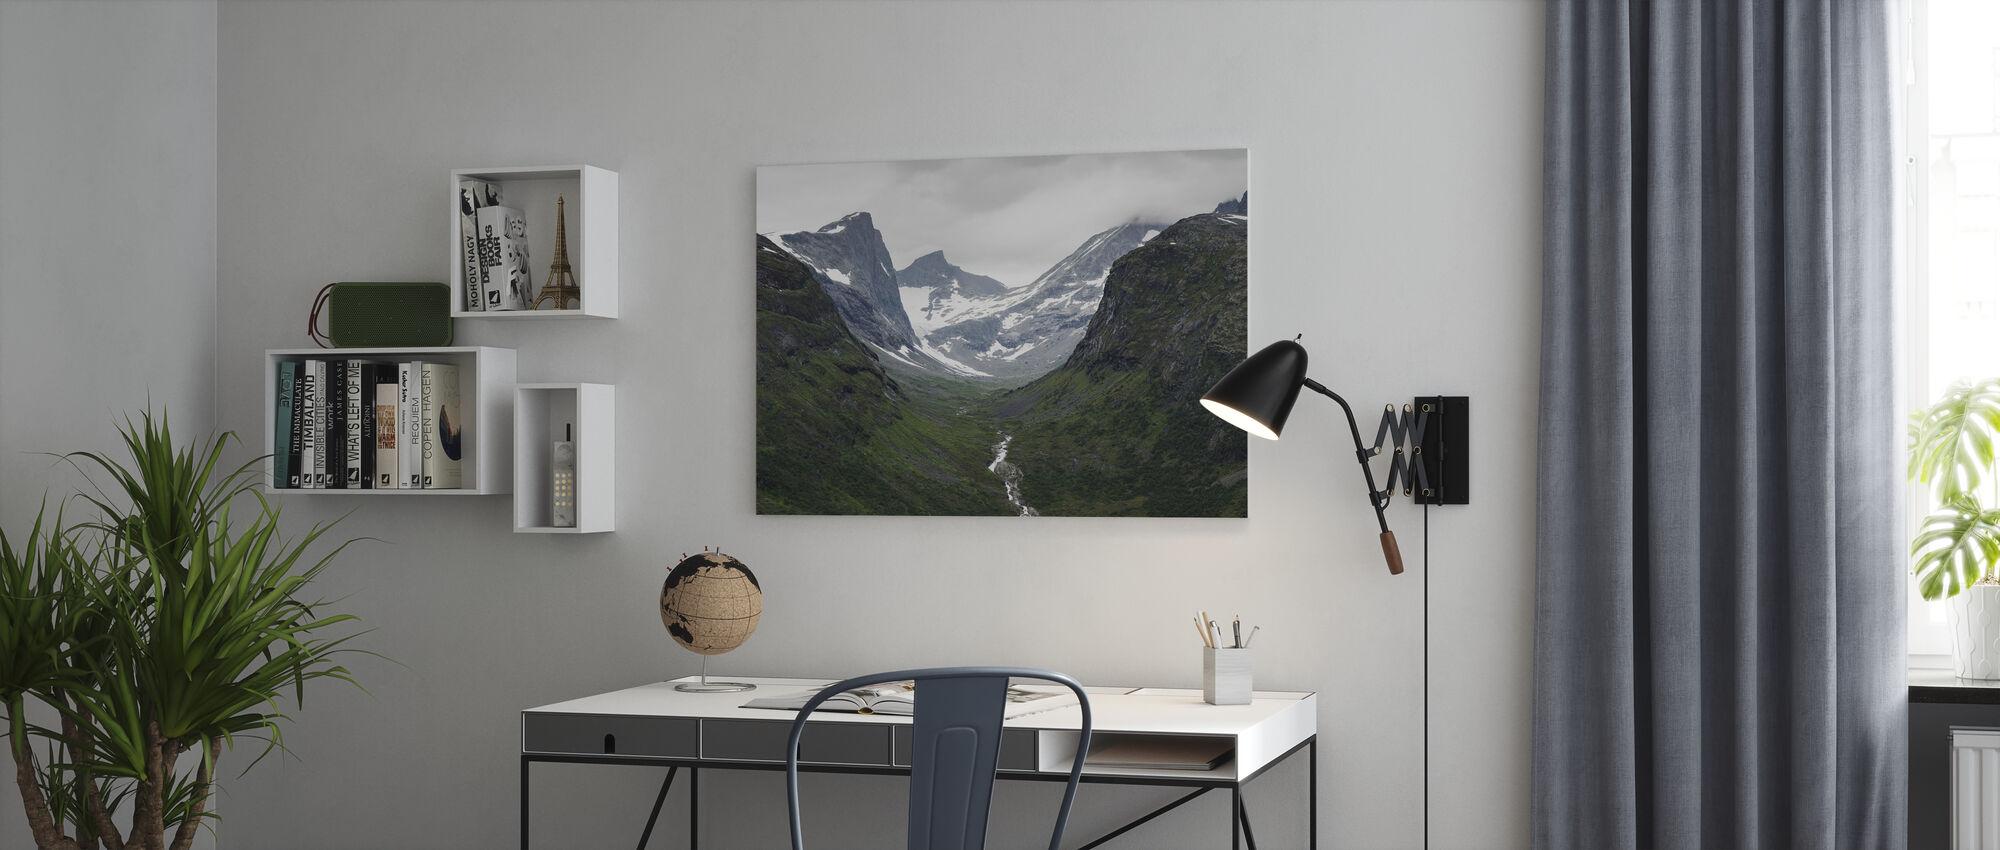 Jotunheimen, Norge - Canvastavla - Kontor